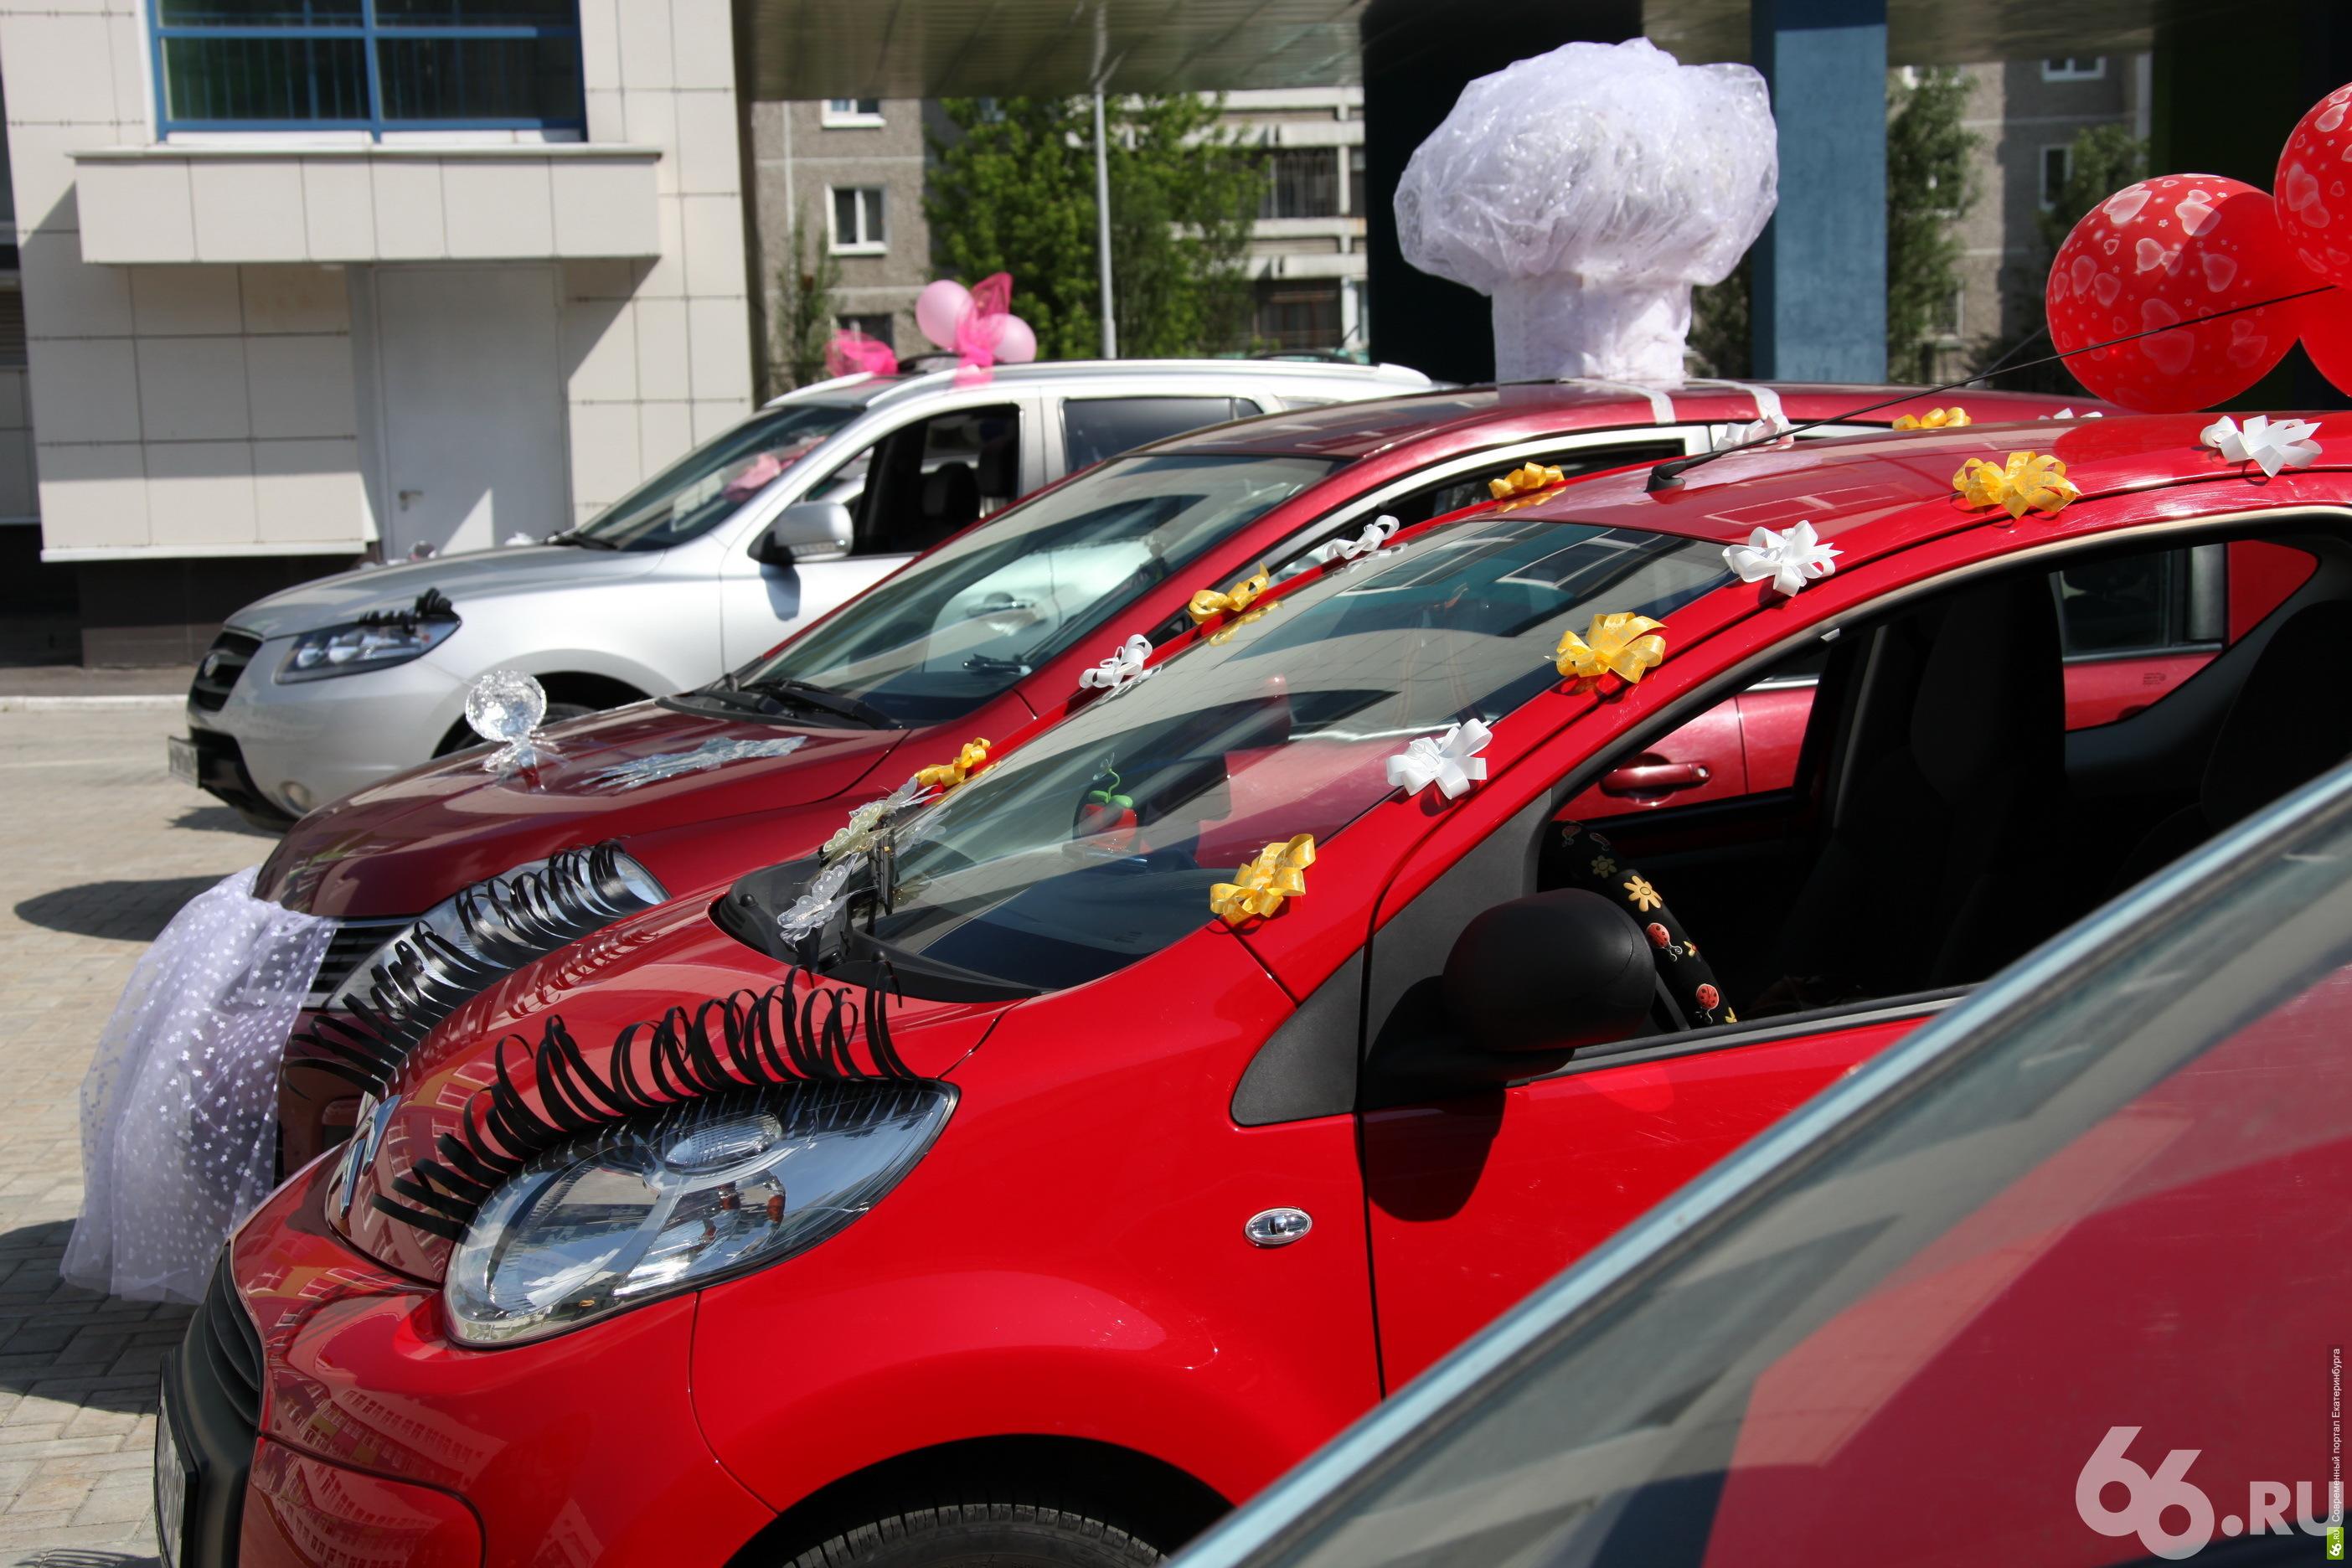 Презентация автомобиля на конкурс автоледи